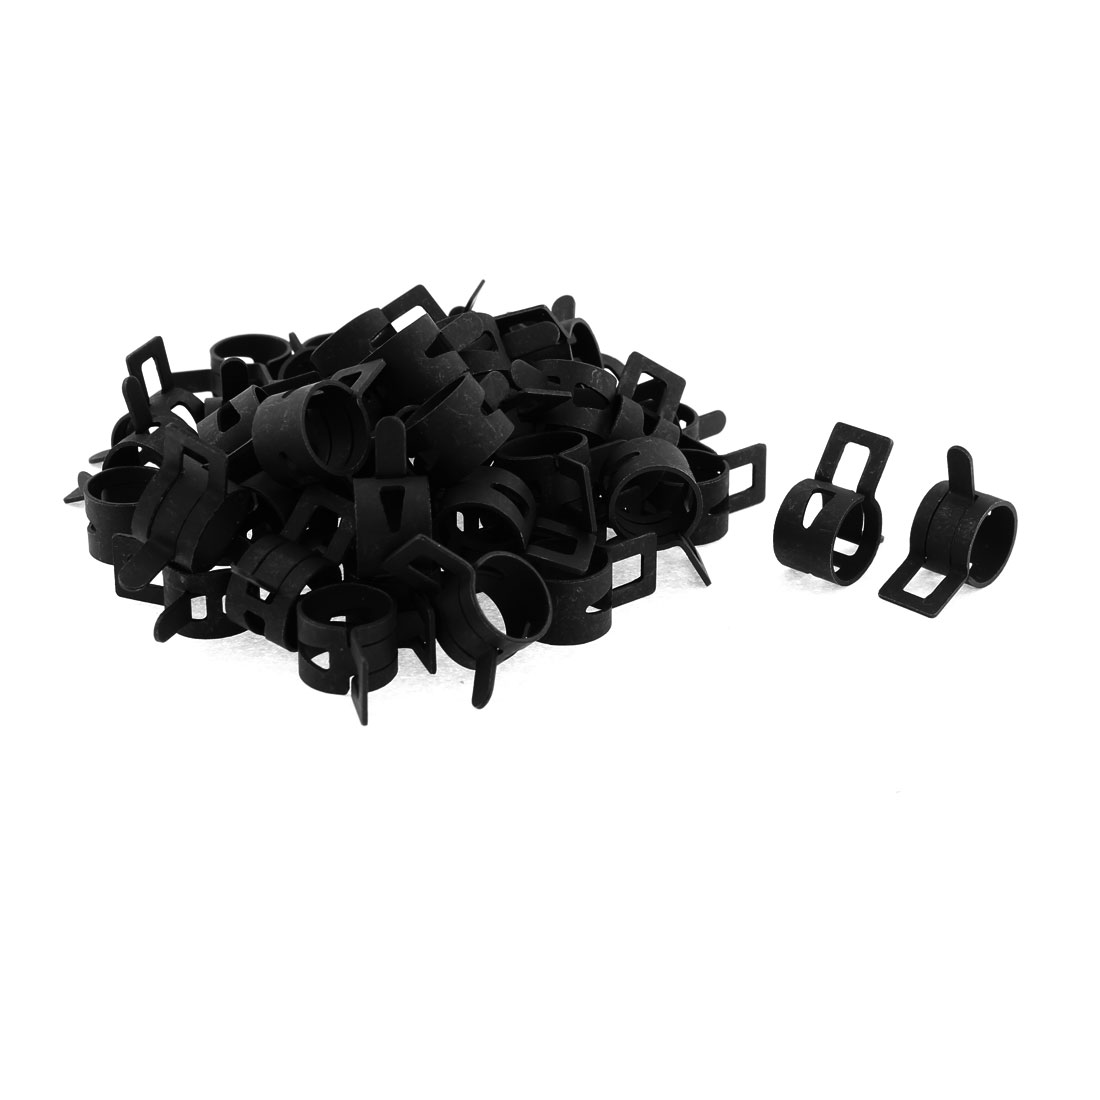 50 Pcs Black Vacuum Fuel Oil Hose Metal Spring Clamps